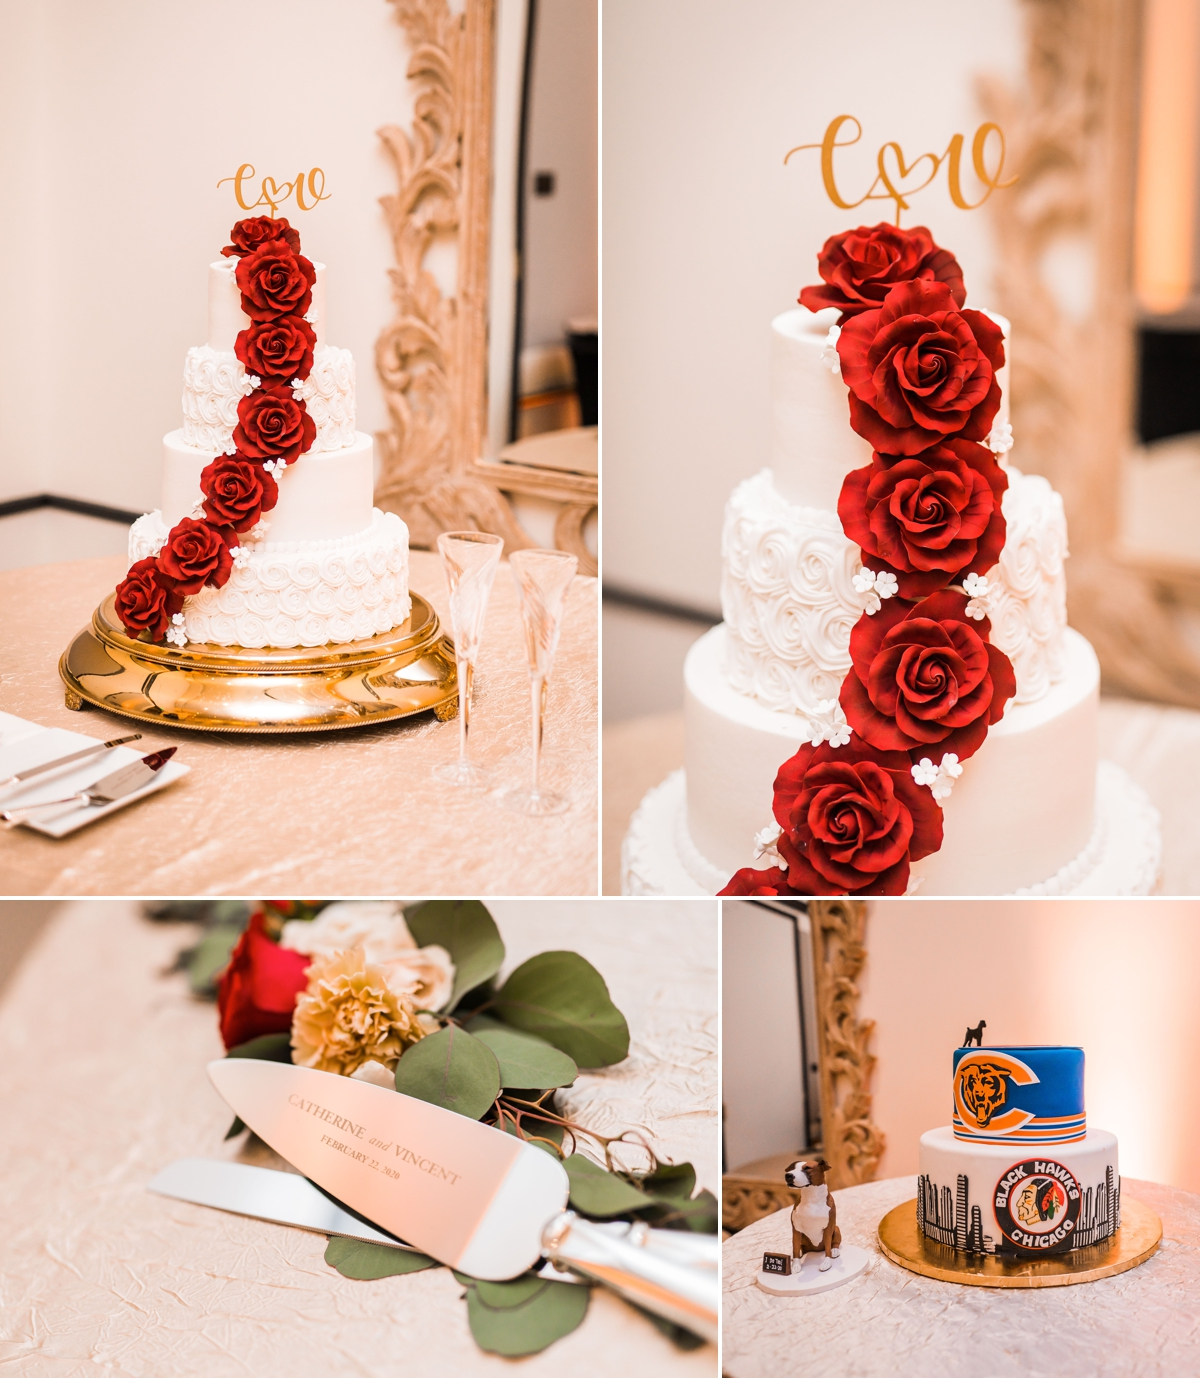 Houston Hotel Wedding Cake with Red Sugar Roses